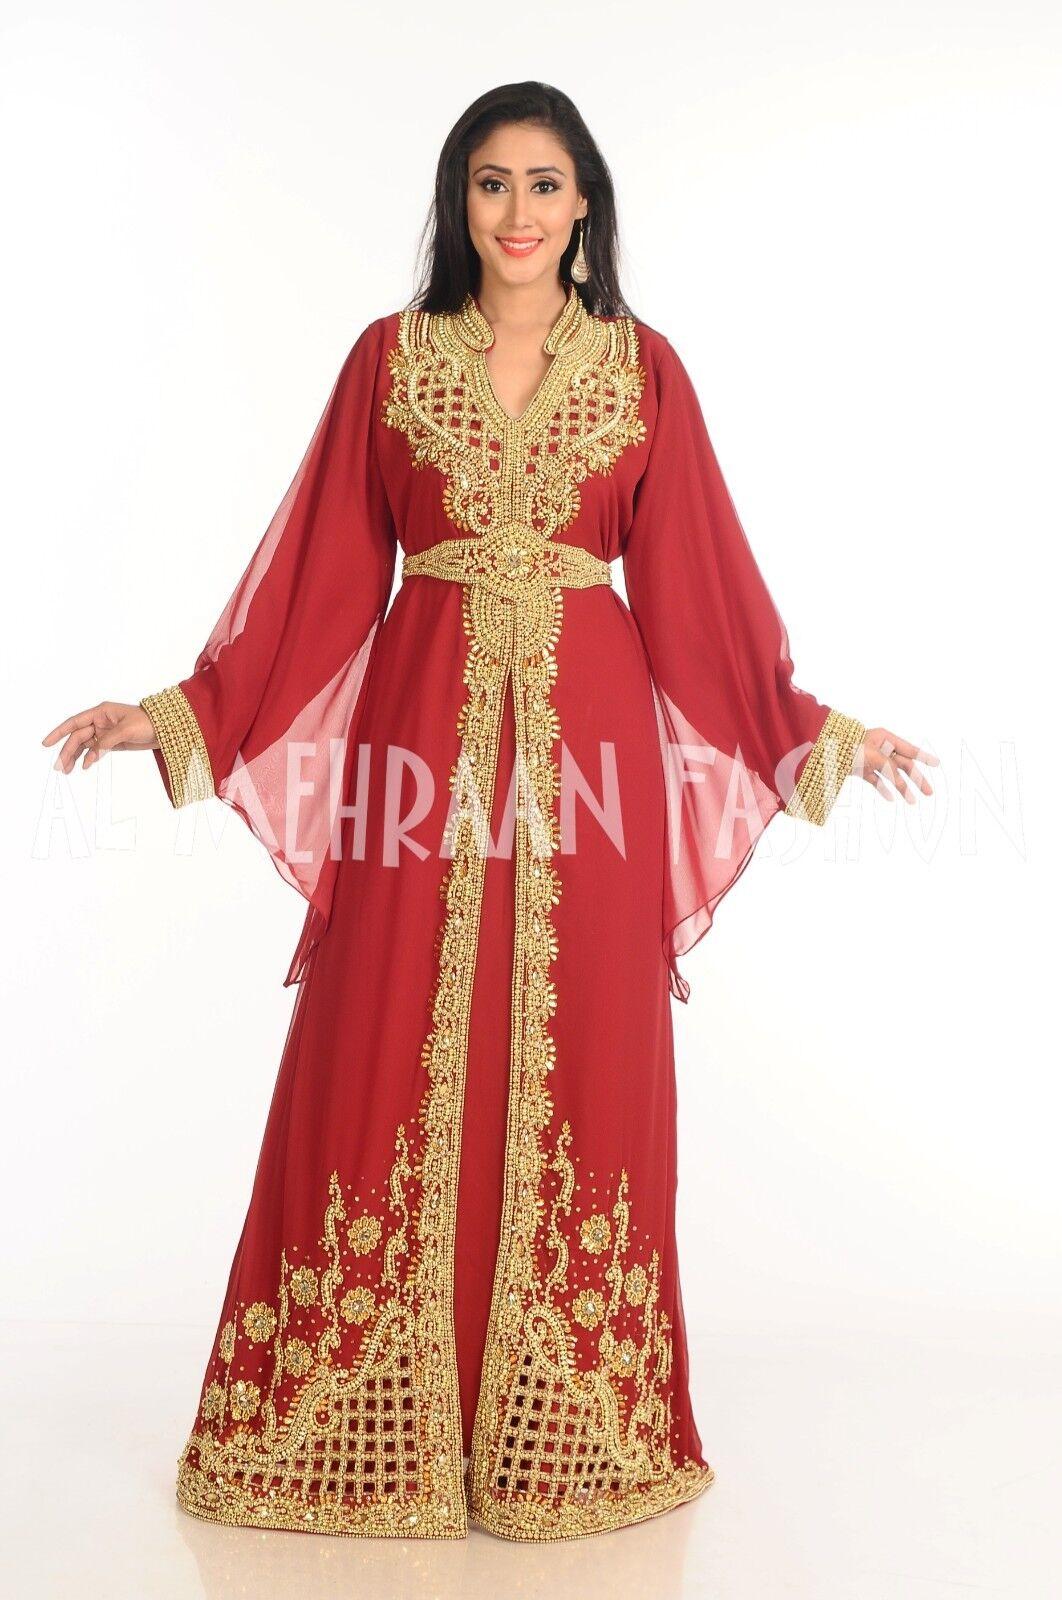 ELEGANT MgoldCCAN FANCY JILBAB ARABIAN DUBAI TAKSHITA WEDDING GOWN DRESS DRESS DRESS  164 c5feb0